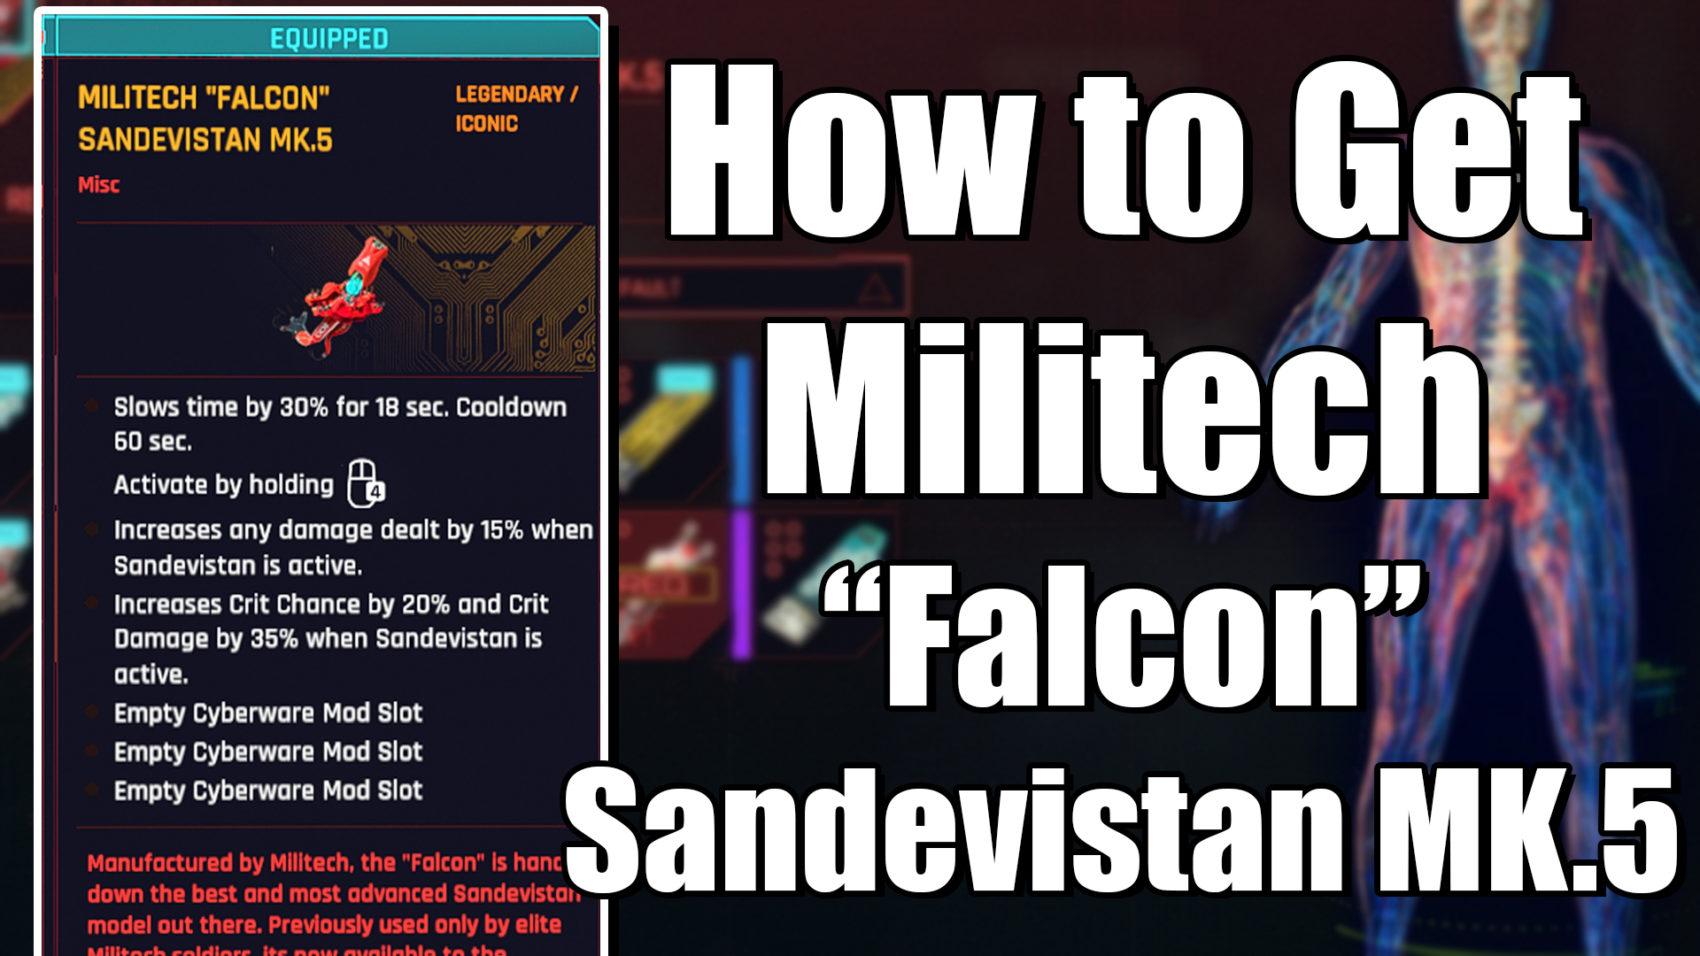 How to get the Militech Falcson Sandevisatn MK.5 in Cyberpunk 2077